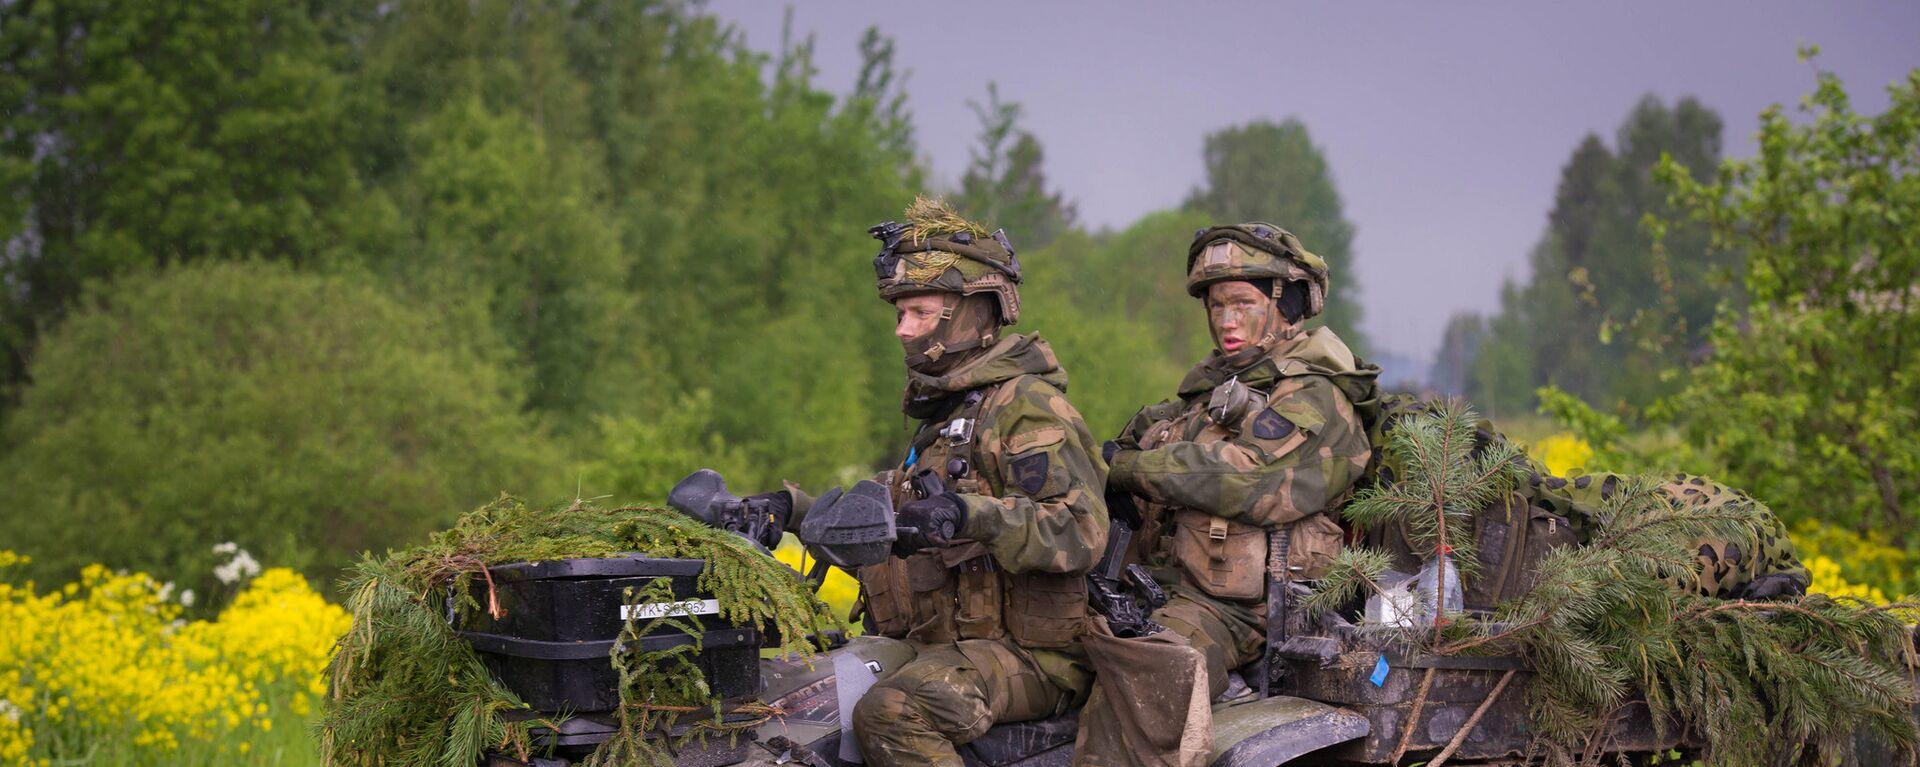 Военные учения Saber Strike 2017 - Sputnik Латвия, 1920, 27.08.2018